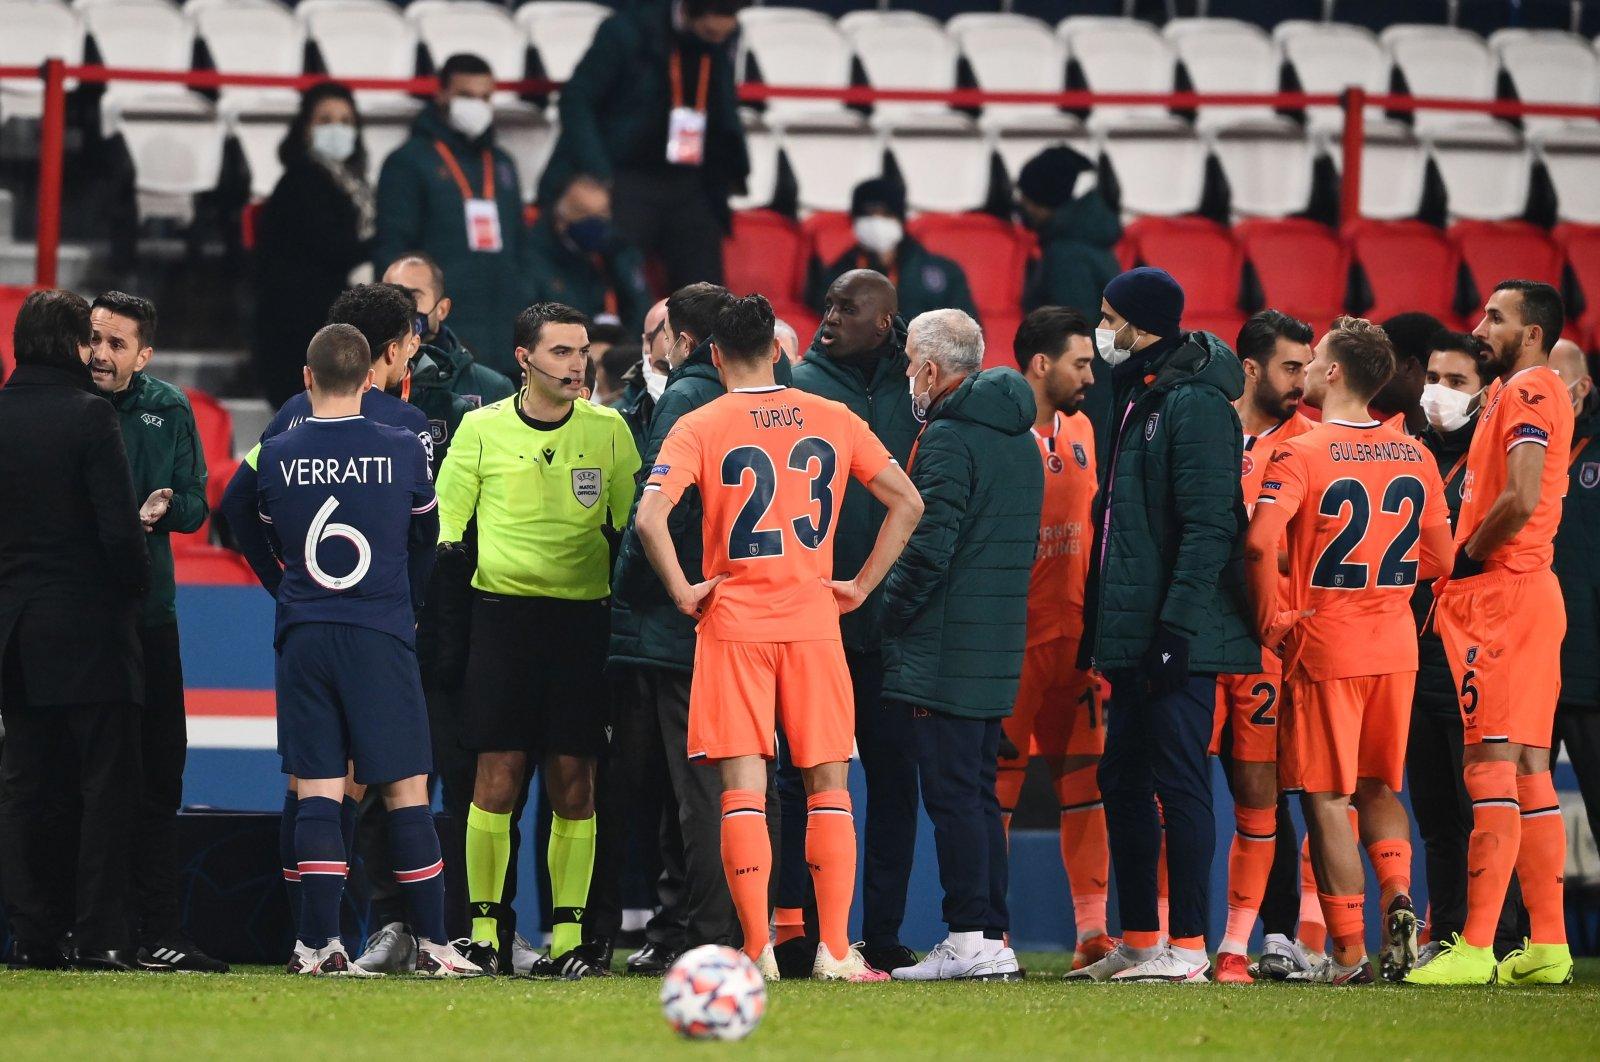 Romanian referee Ovidiu Hategan (in yellow) talks to Başakşehir staff members past and players during the UEFA Champions League match against Paris Saint-Germain at the Parc des Princes stadium in Paris, France, Dec. 8, 2020. (AFP Photo)